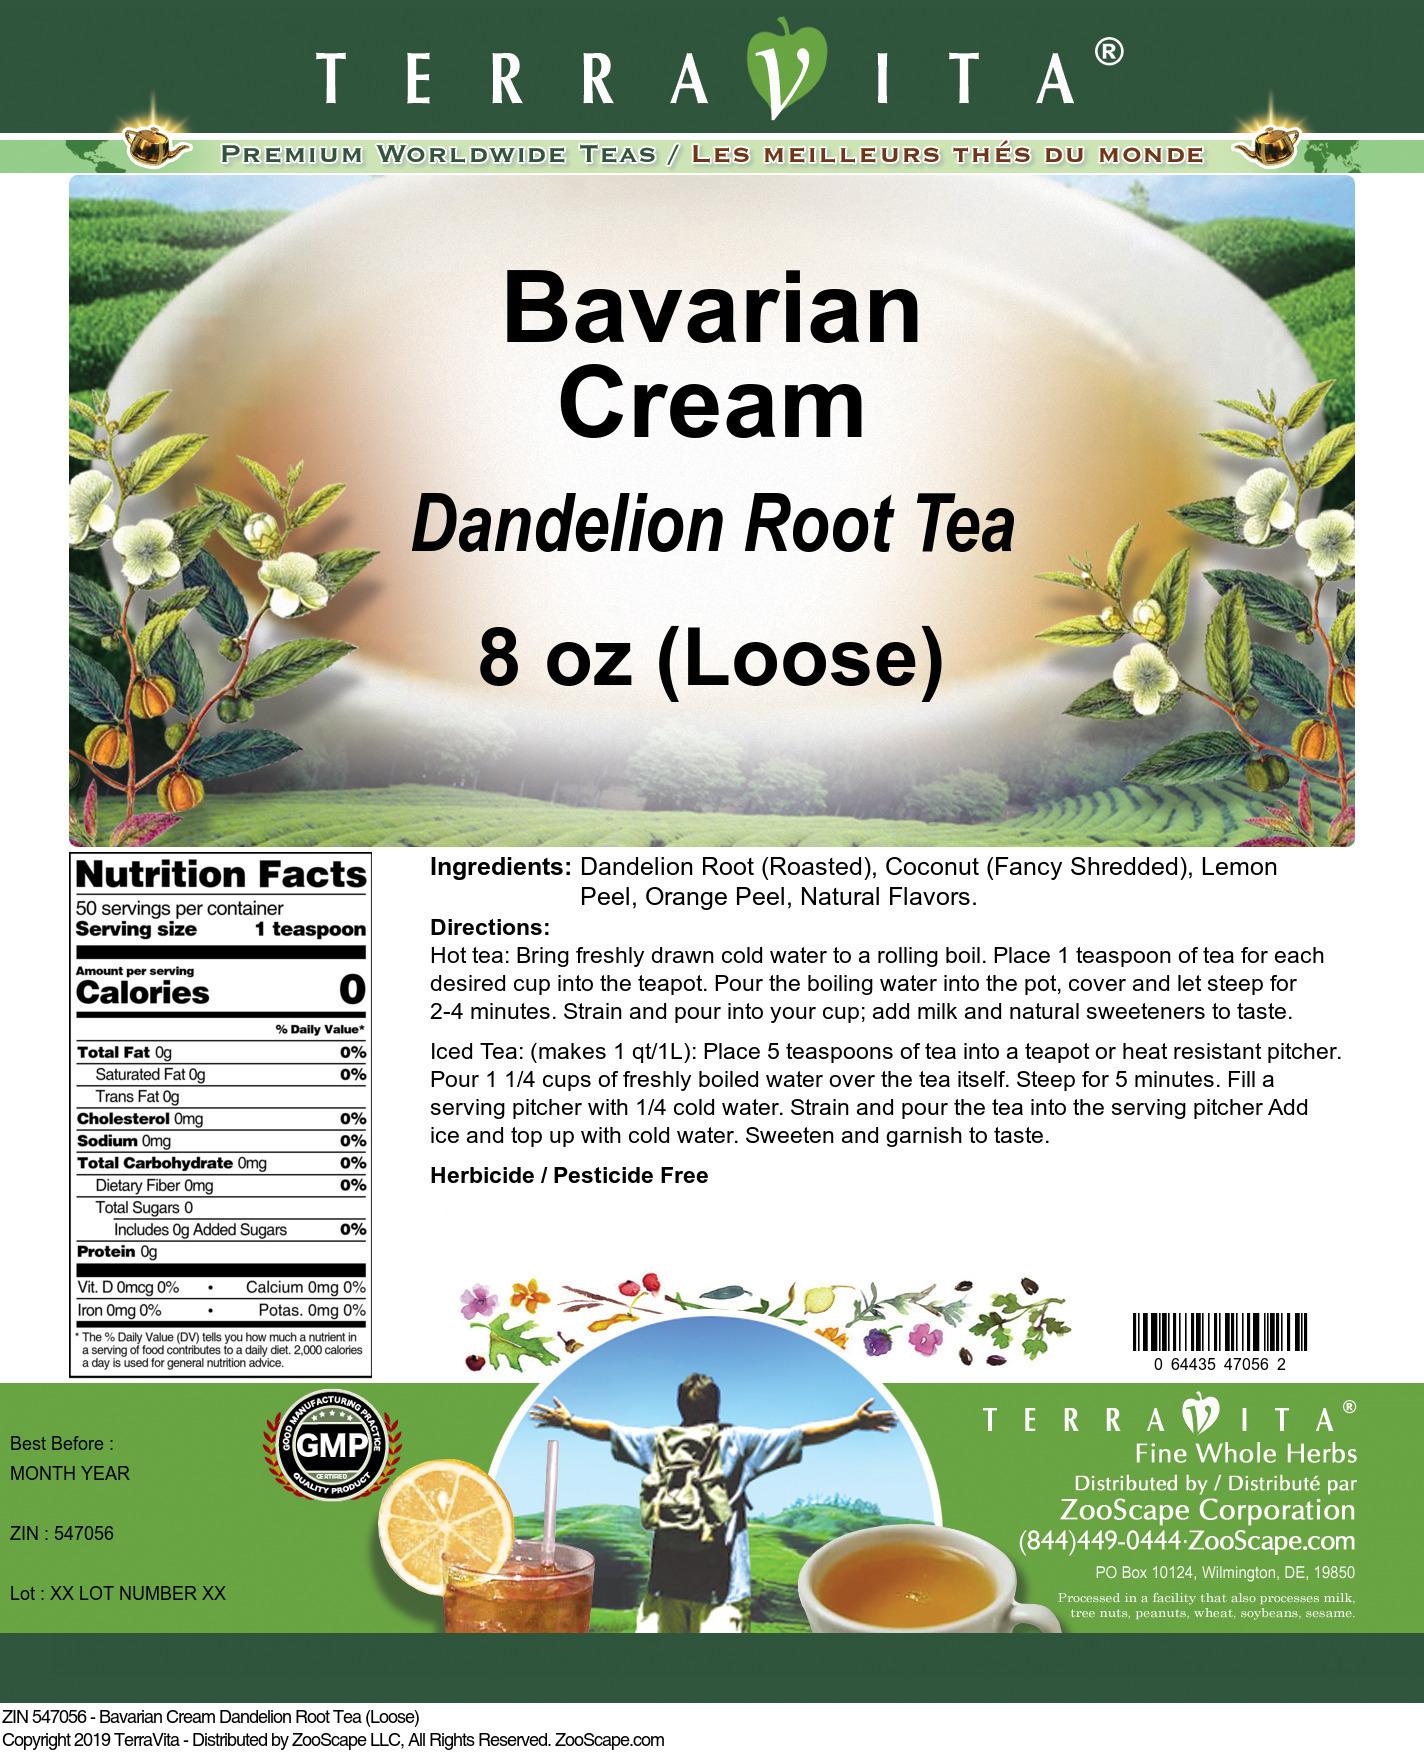 Bavarian Cream Dandelion Root Tea (Loose)